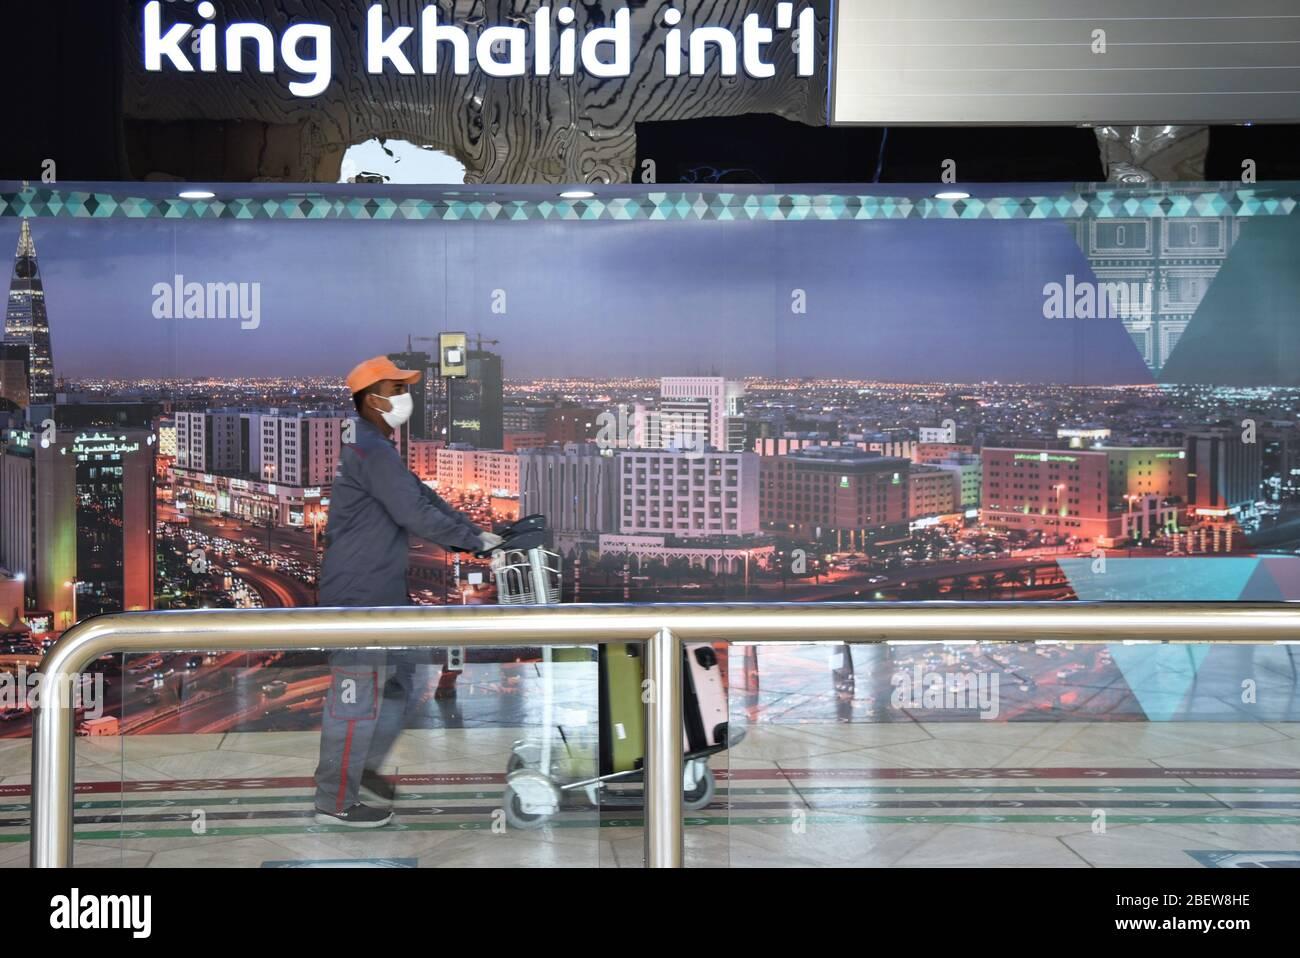 Riyadh Saudi Arabia 15th Apr 2020 A Man Wearing A Face Mask Walks At The King